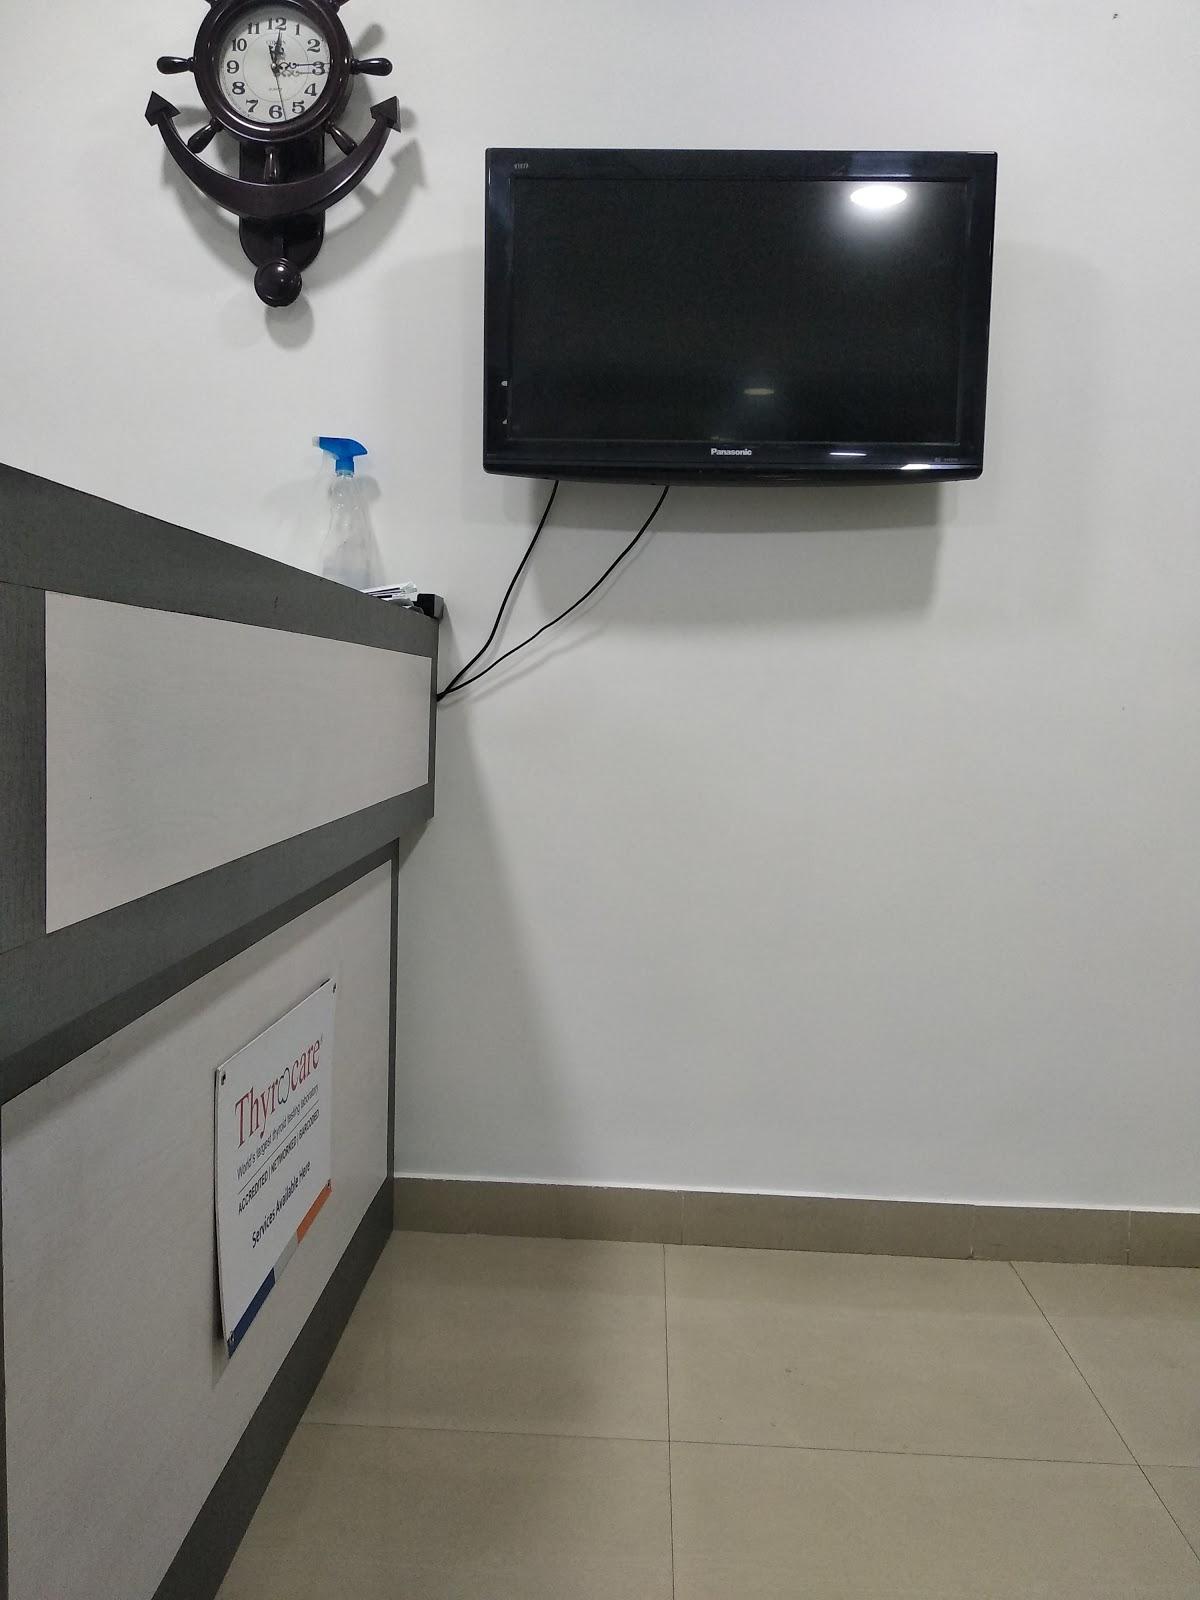 blood bank Thyrocare near Nagercoil Tamil Nadu